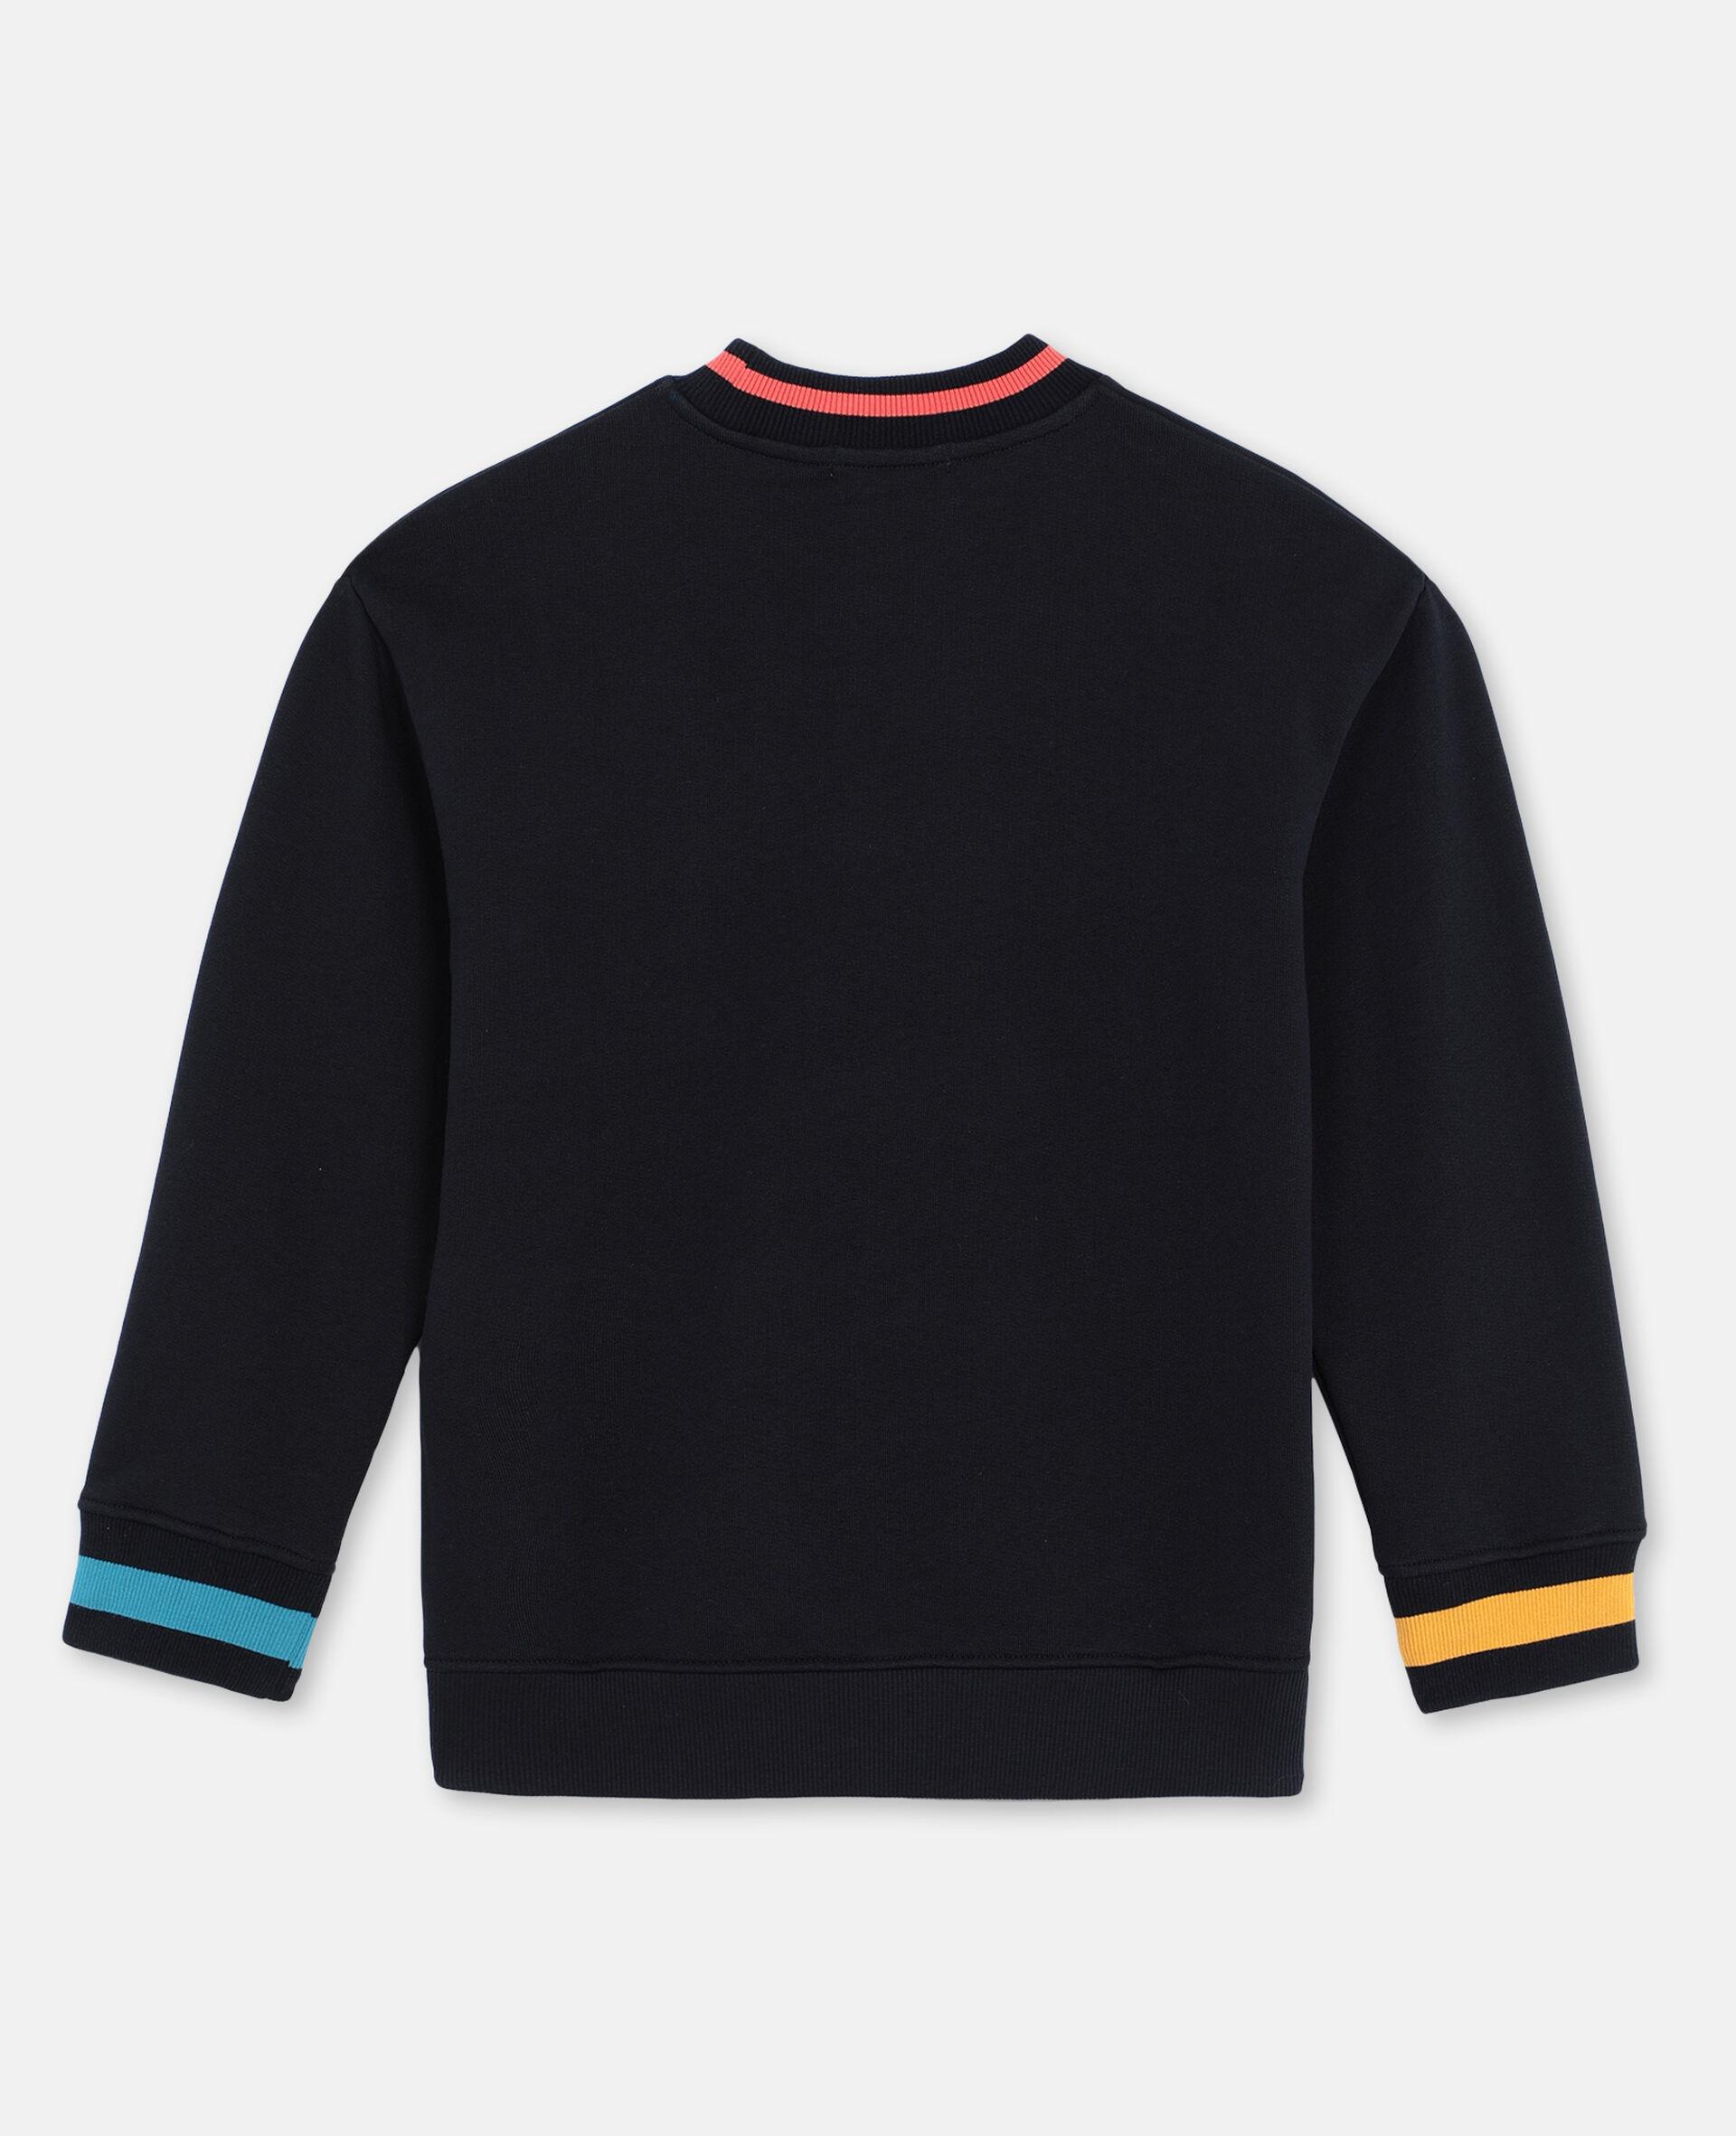 Skater Oversize Cotton Sweatshirt -Black-large image number 3